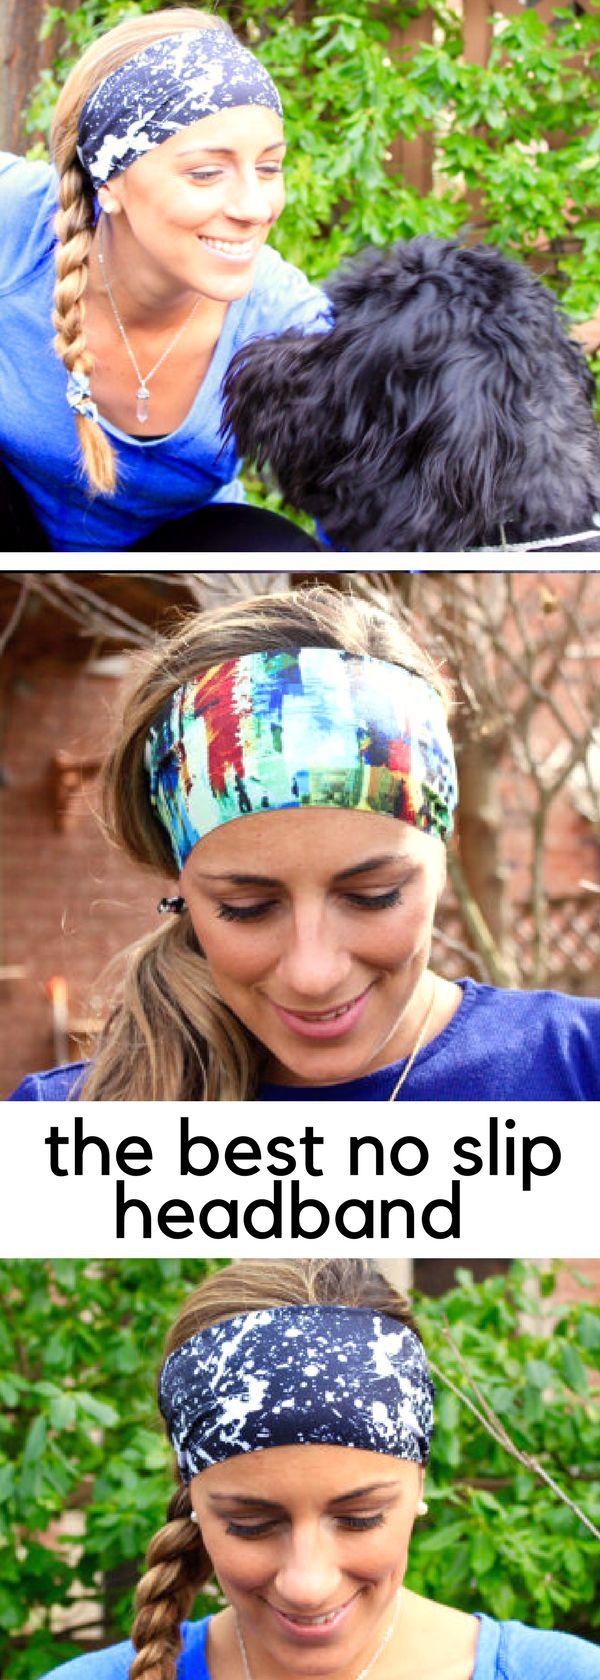 Yoga Headband, Black Splatter, Workout Headband, Running Headband, Non Slip Headbands, Wide Headband - #afflink